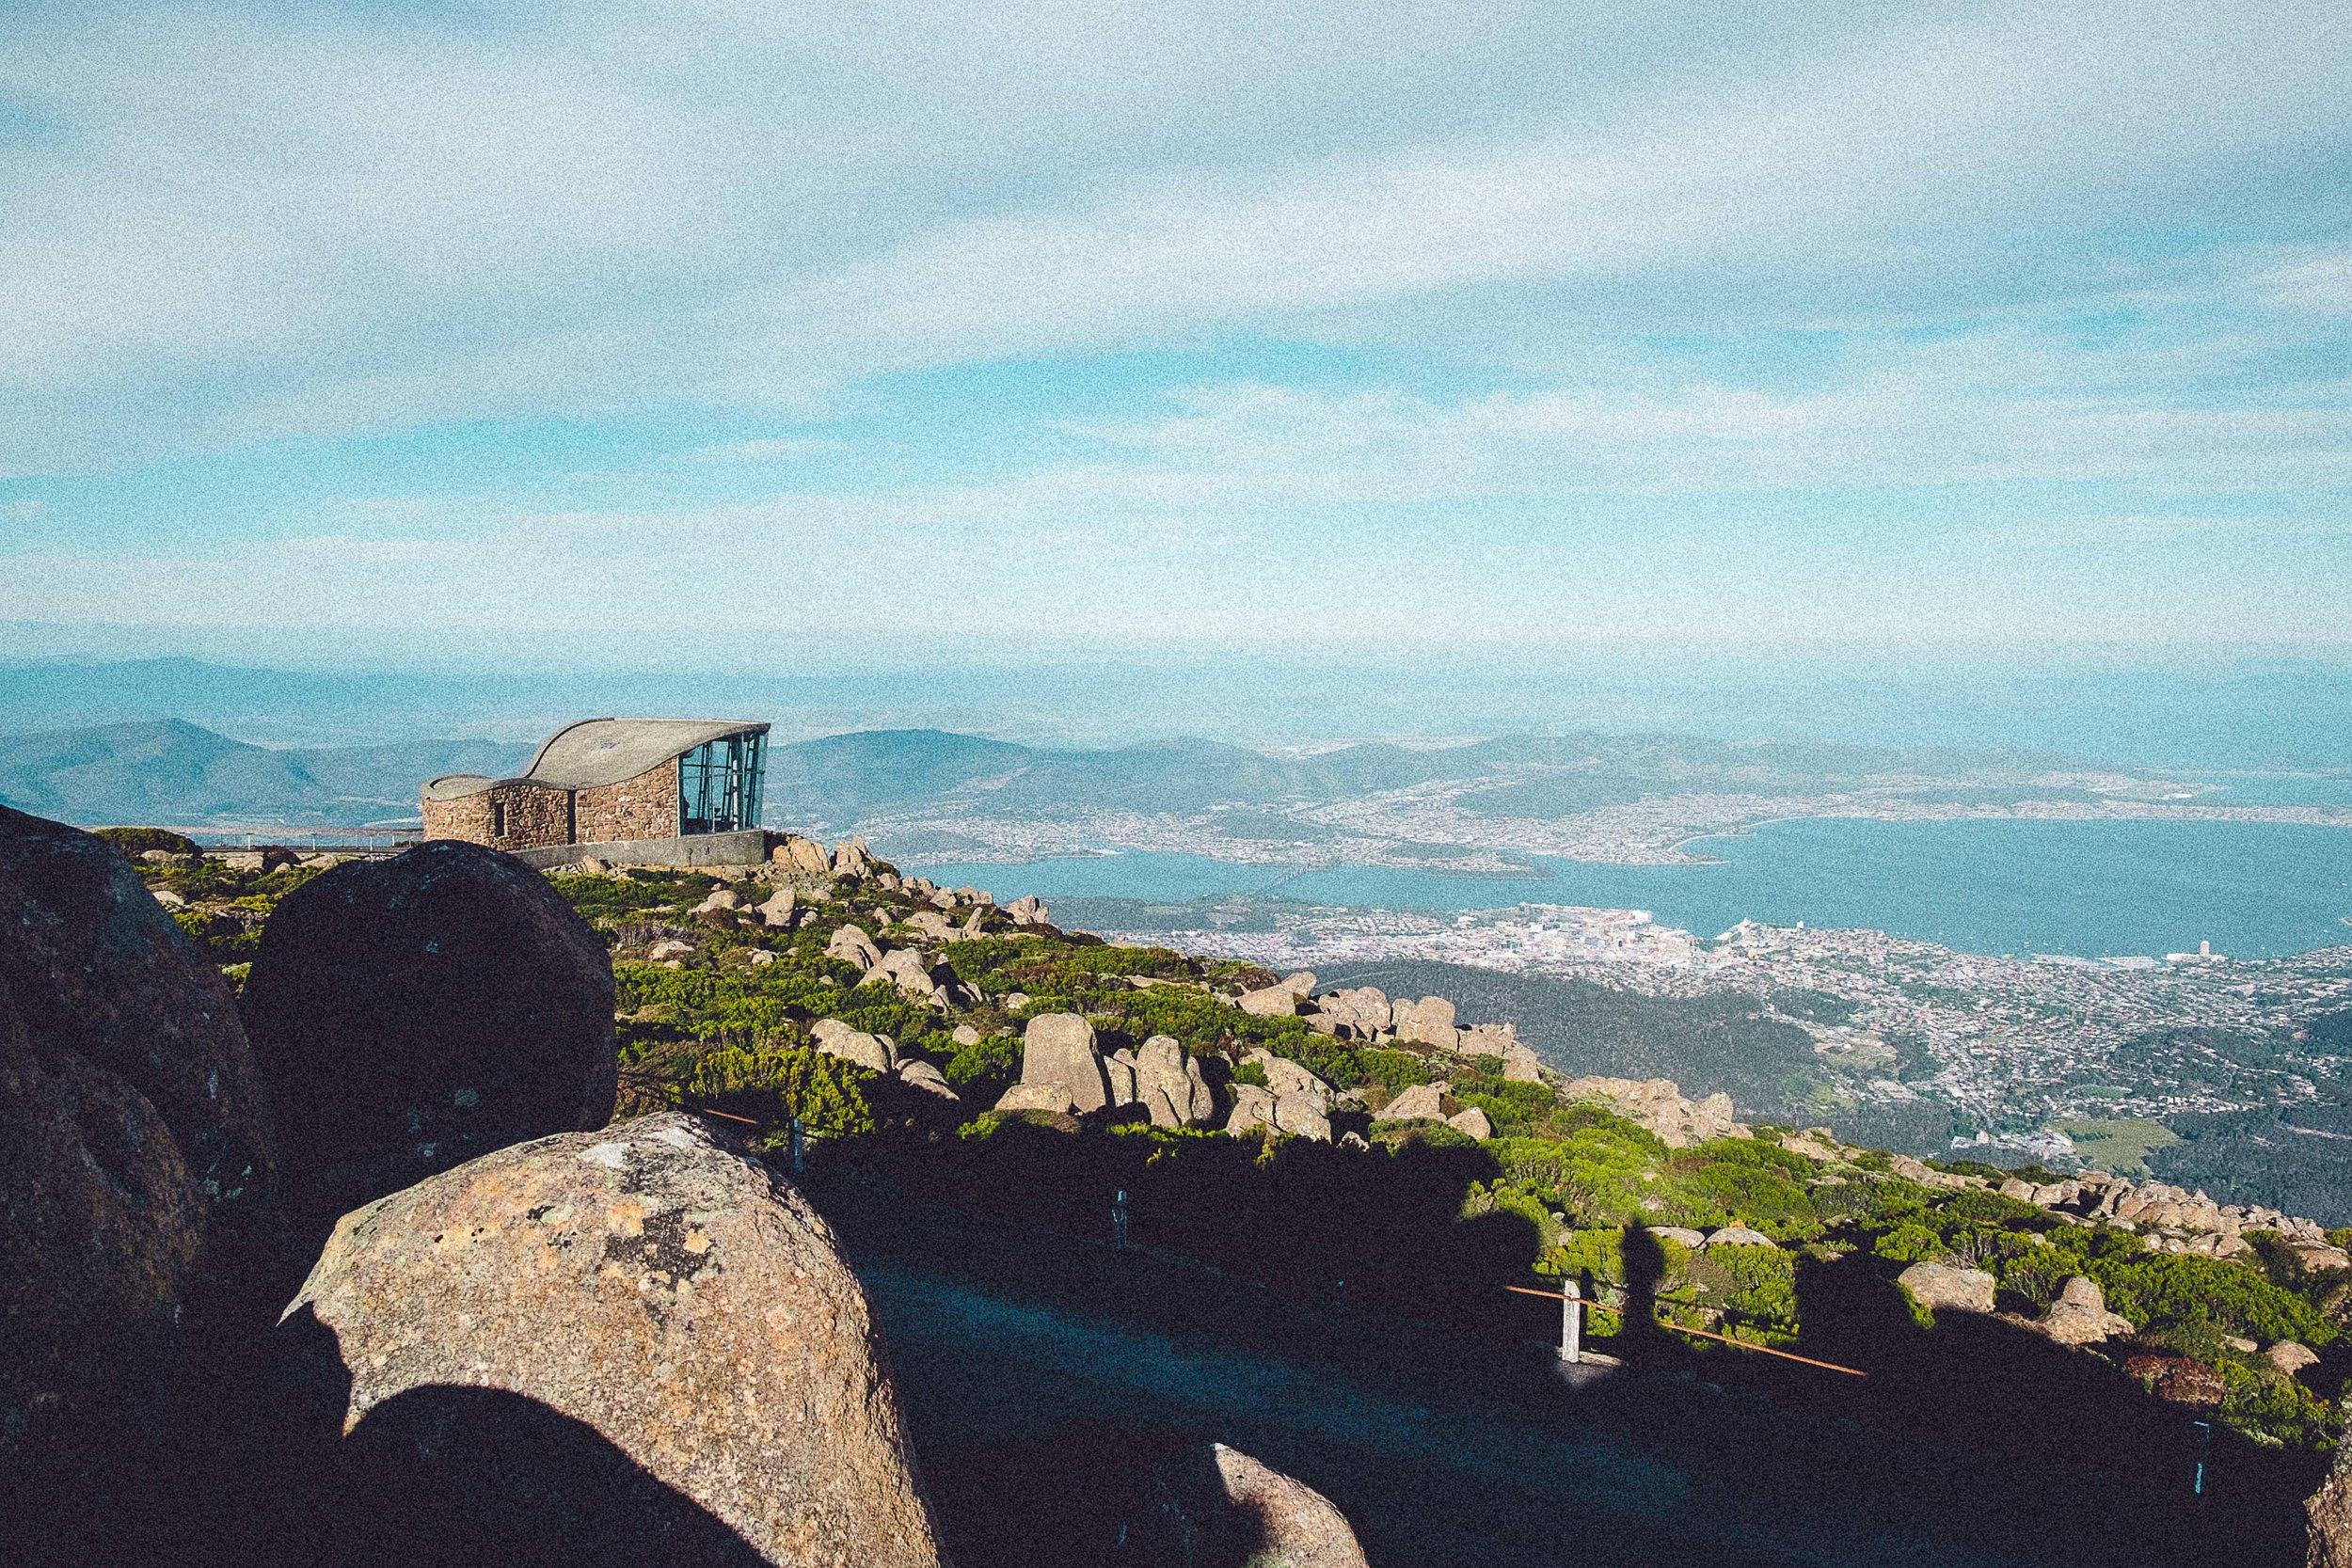 Rachel Off Duty: How to Spend 5 Days in Tasmania - Mount Wellington